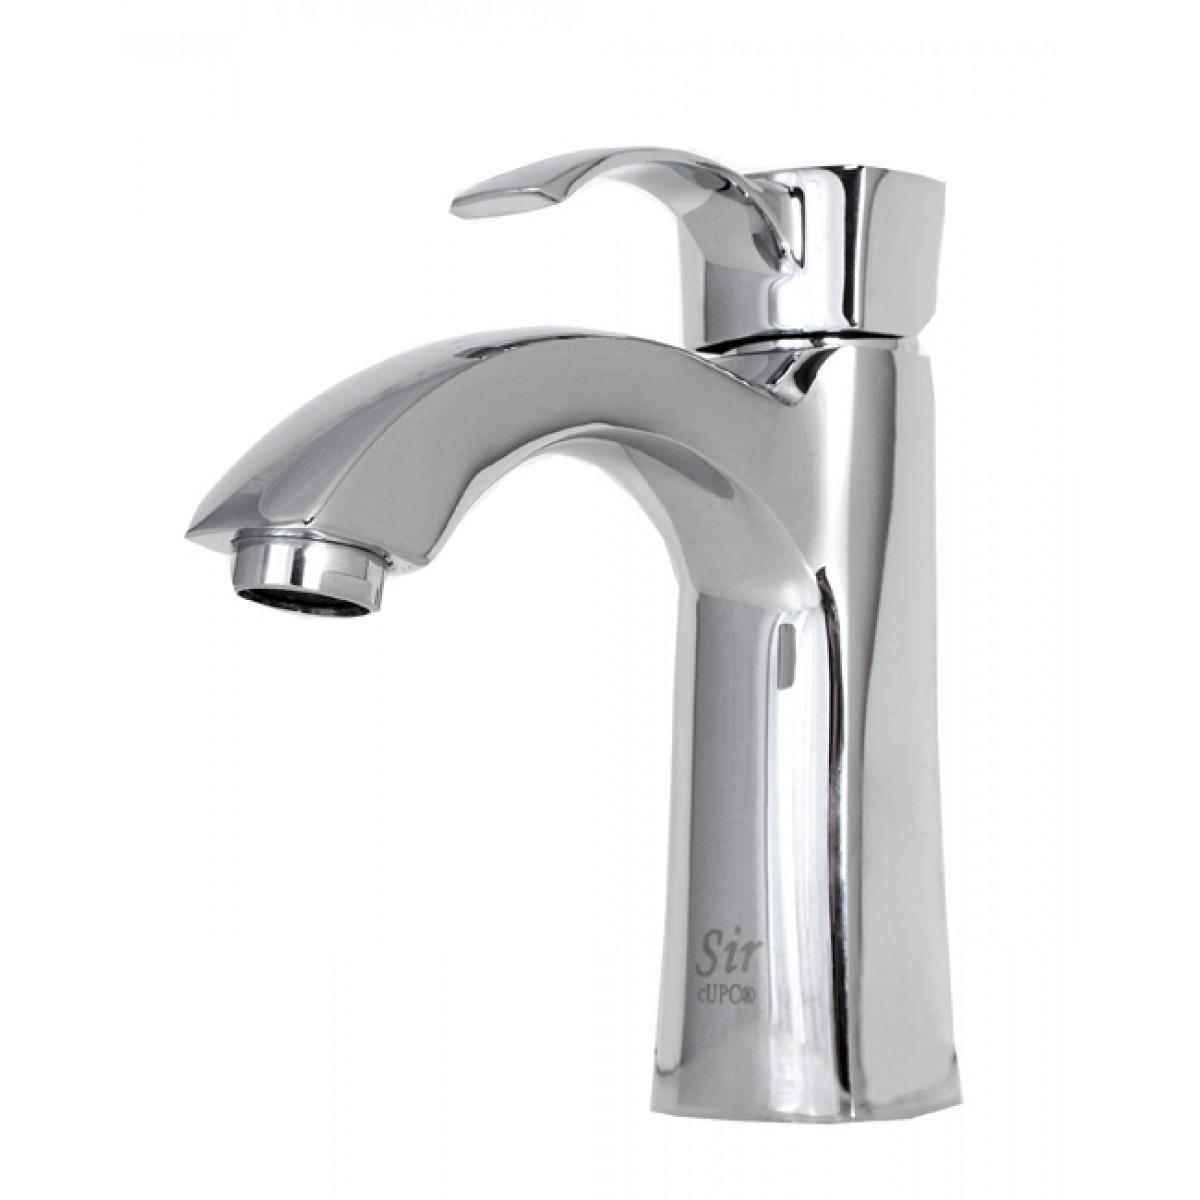 Lead Free Chrome Bathroom Lavatory Vessel Sink Faucet 6 1 2 X 3 1 4 Inch